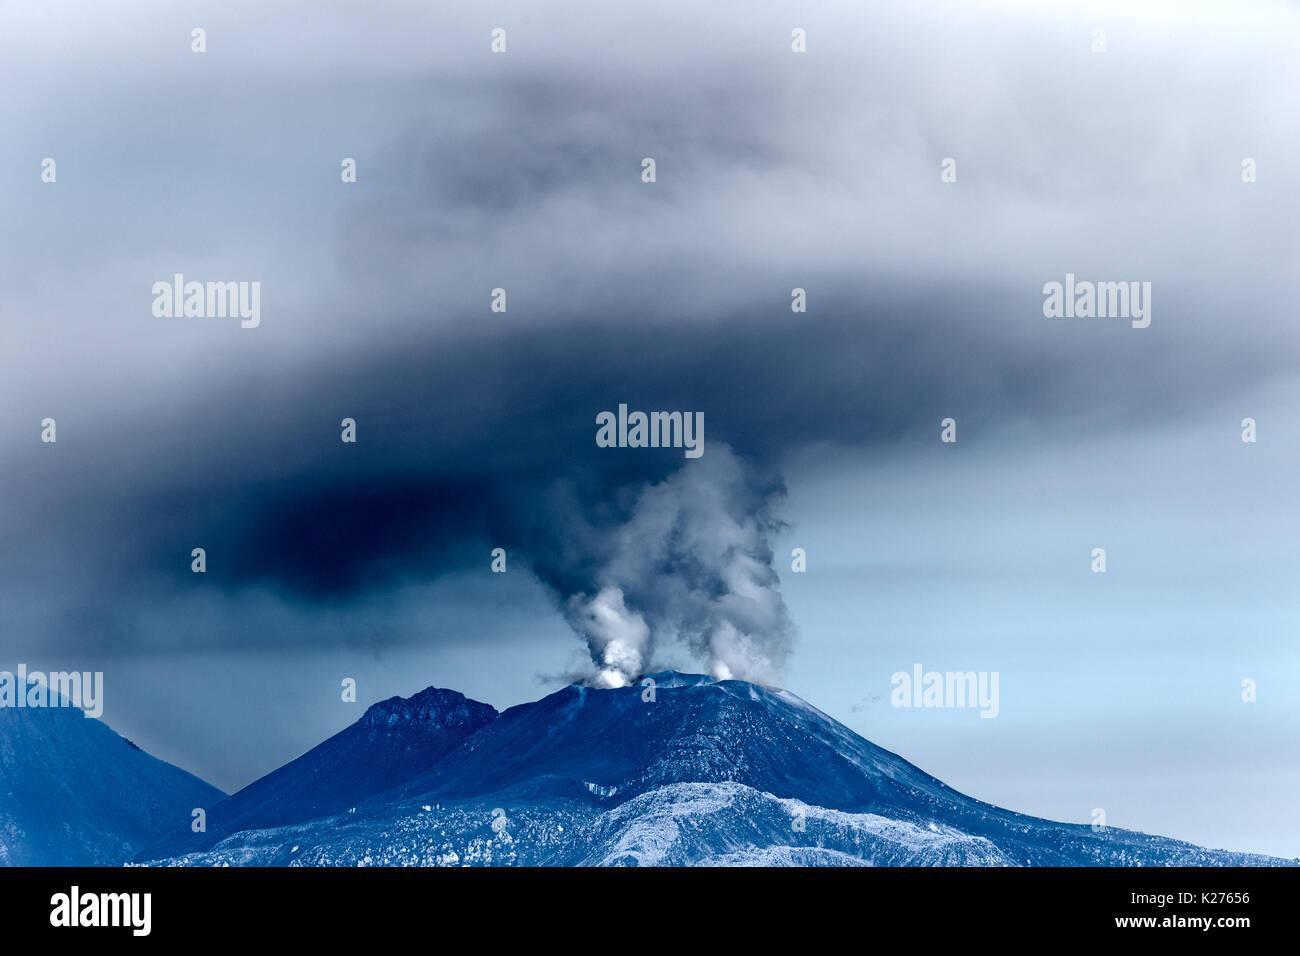 Savancaya Volcano (with plume) plus Ampato Momia Juanita (Spanish for 'Mummy Juanita'), aka the 'Inca' Ice Maiden was found on it (left). Peru - Stock Image